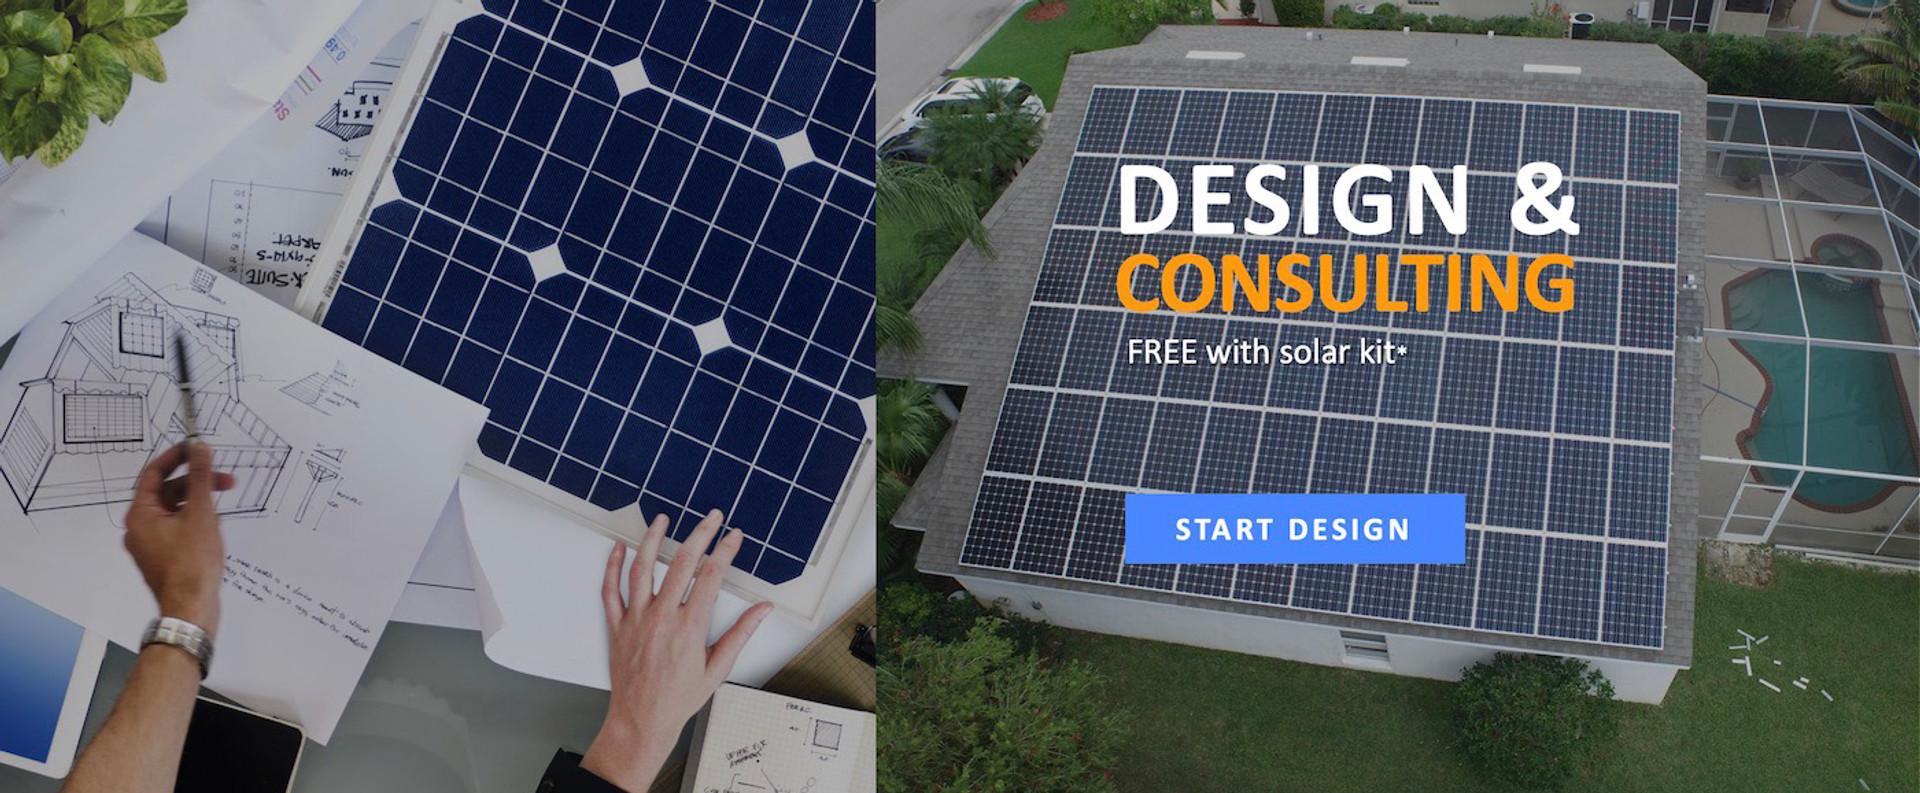 Solar permit plans